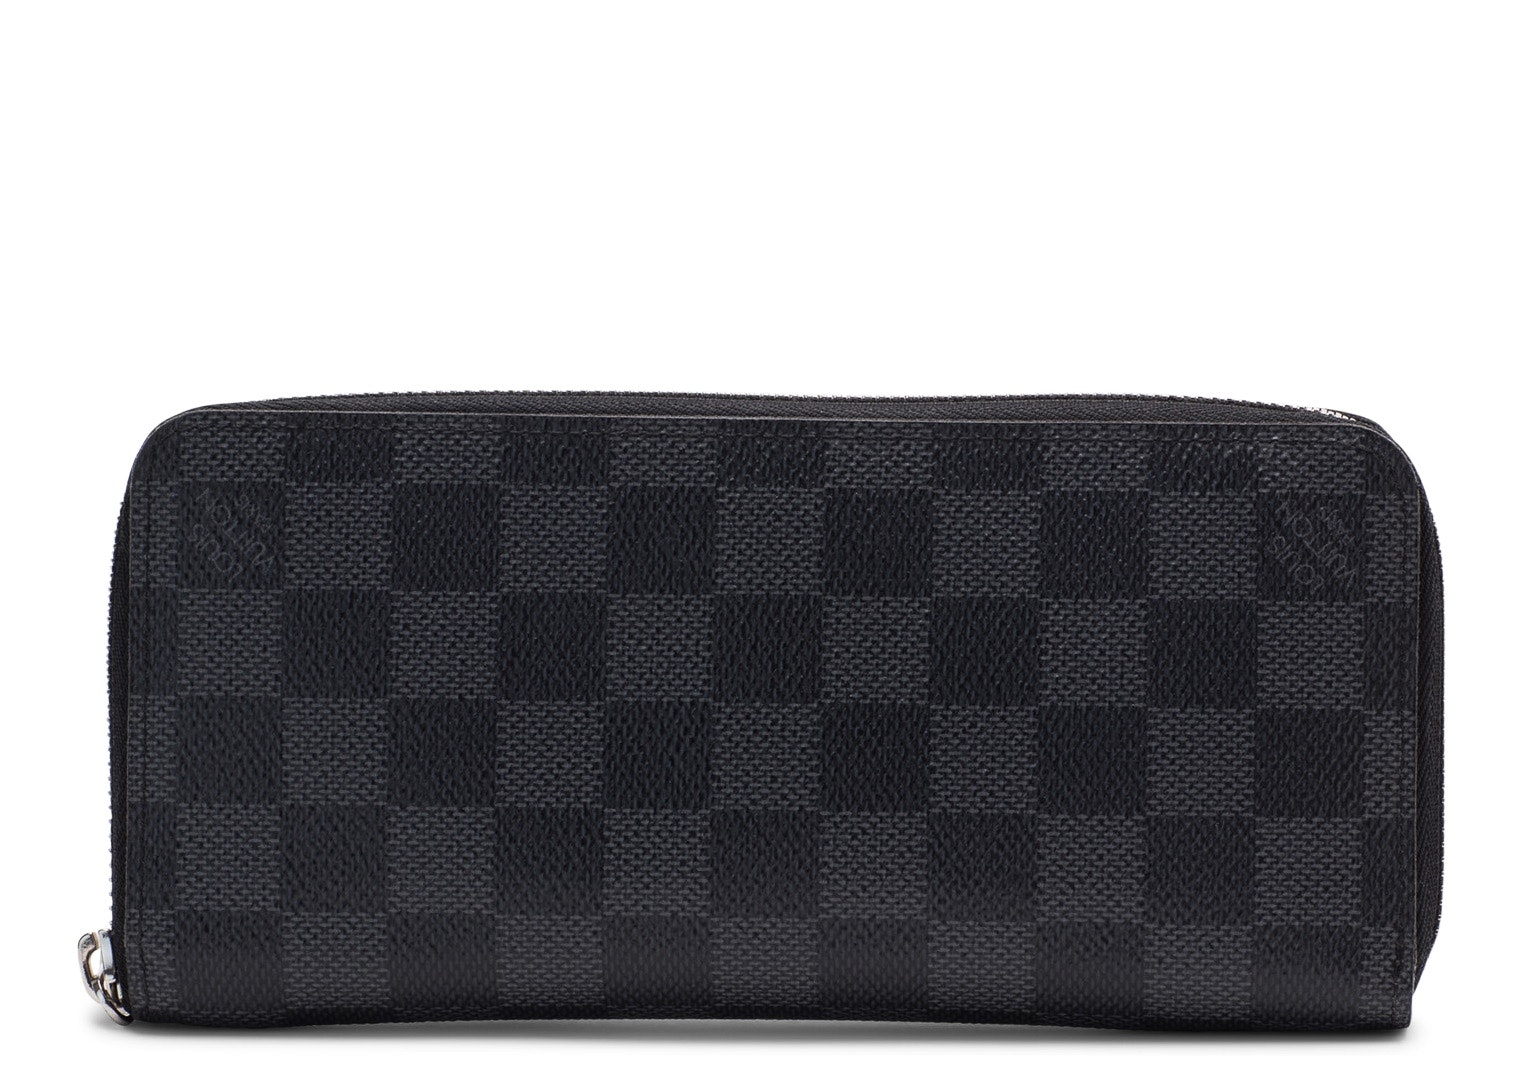 Louis Vuitton Zippy Vertical Damier Graphite Black